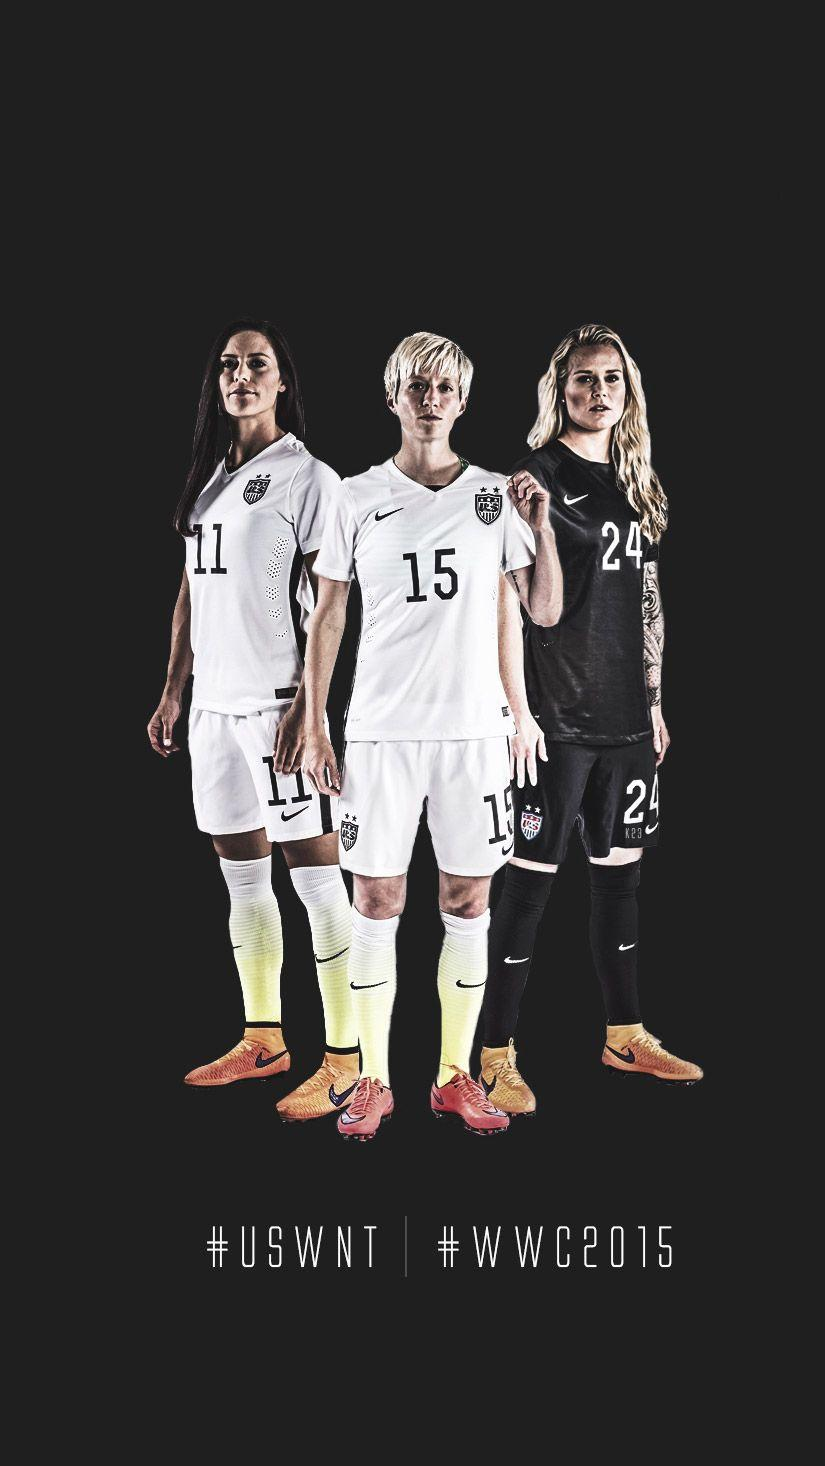 Soccer Wallpaper Girl : soccer, wallpaper, Soccer, Players, Women, Wallpapers, Wallpaper